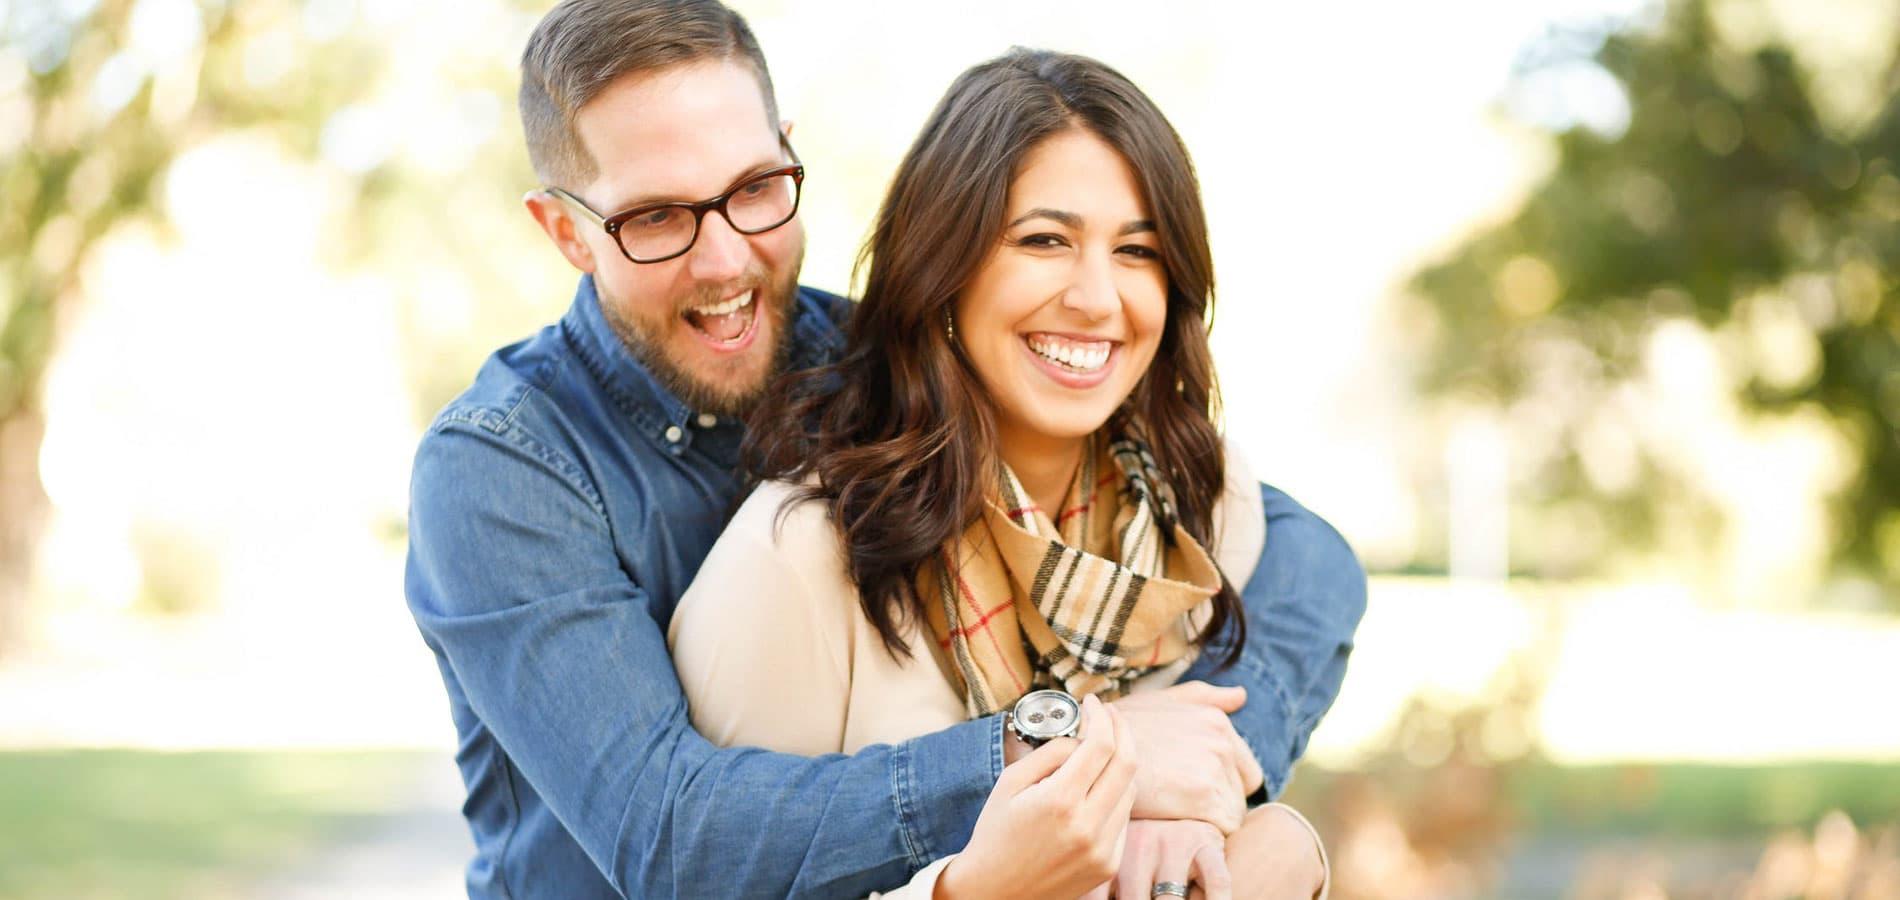 Smile Happiness Hugging Man Woman